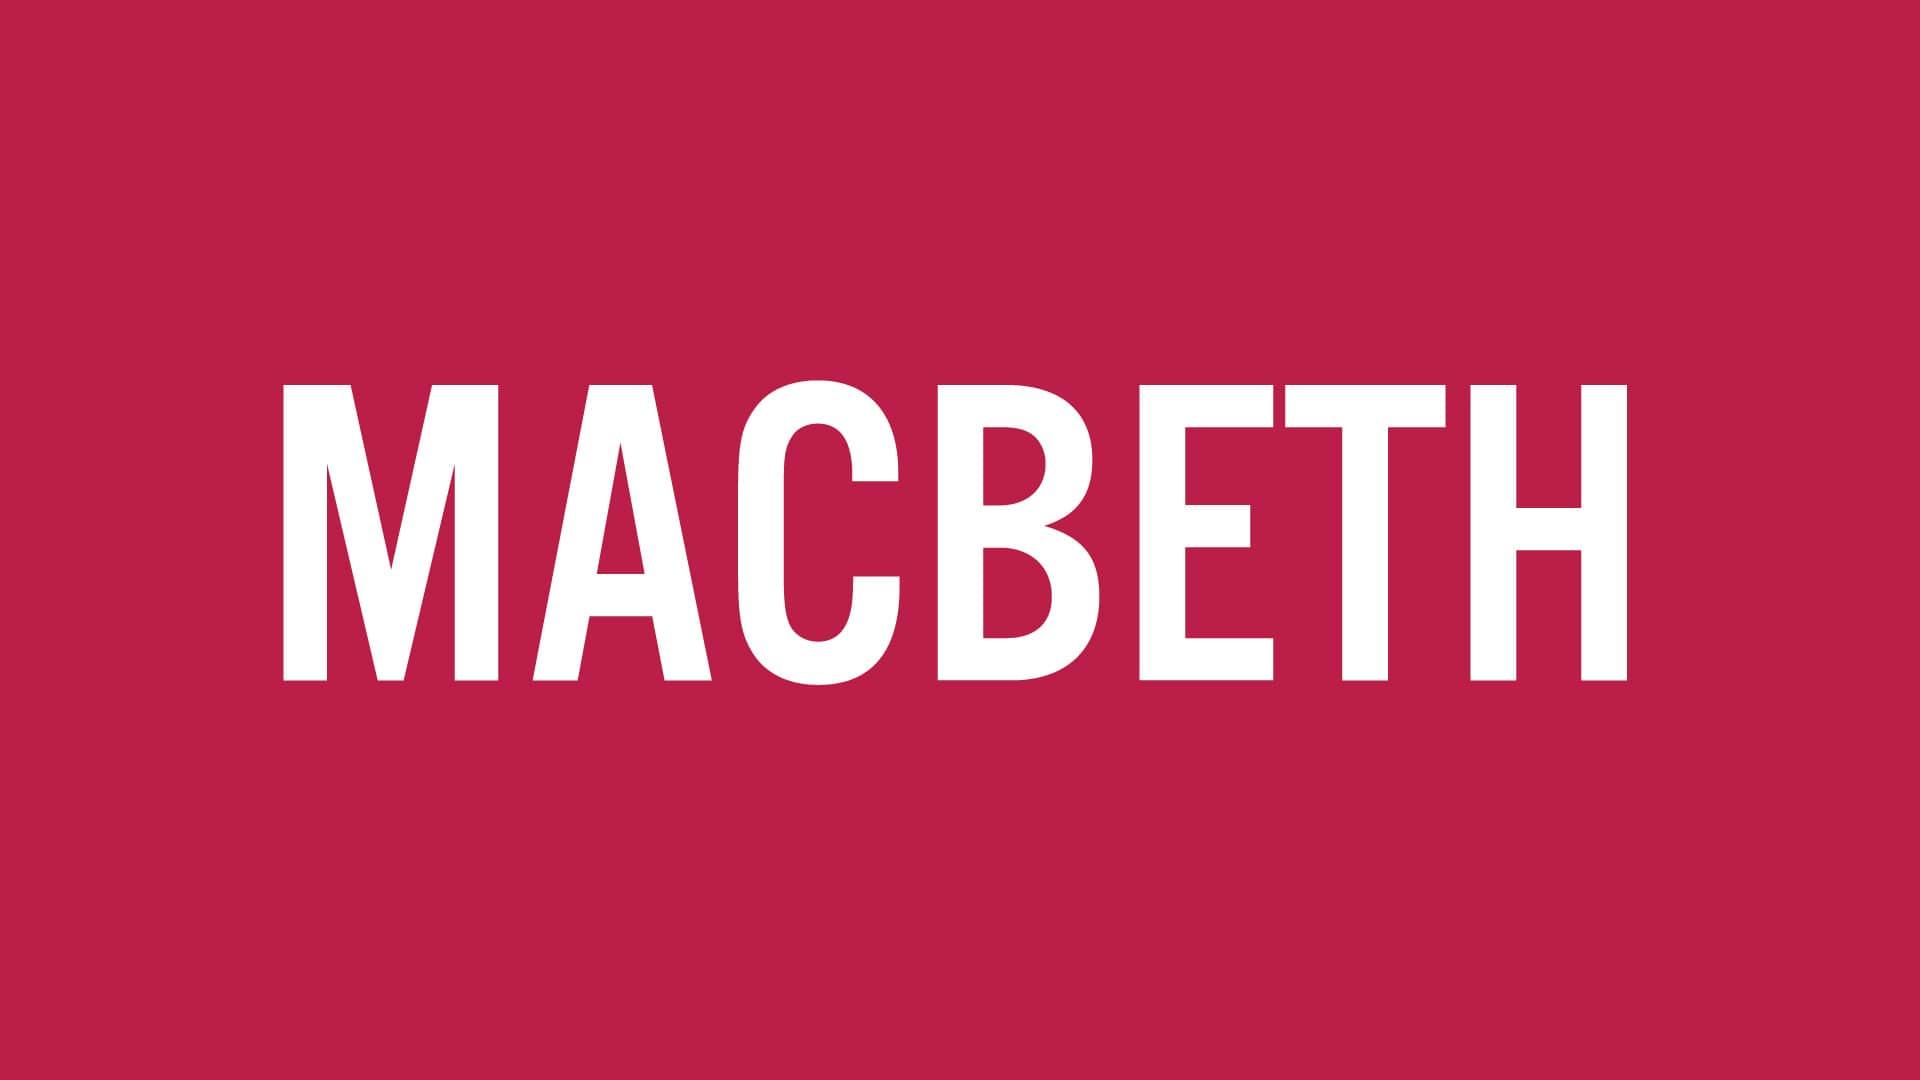 MACBETH — FEB. 3–24, 2022